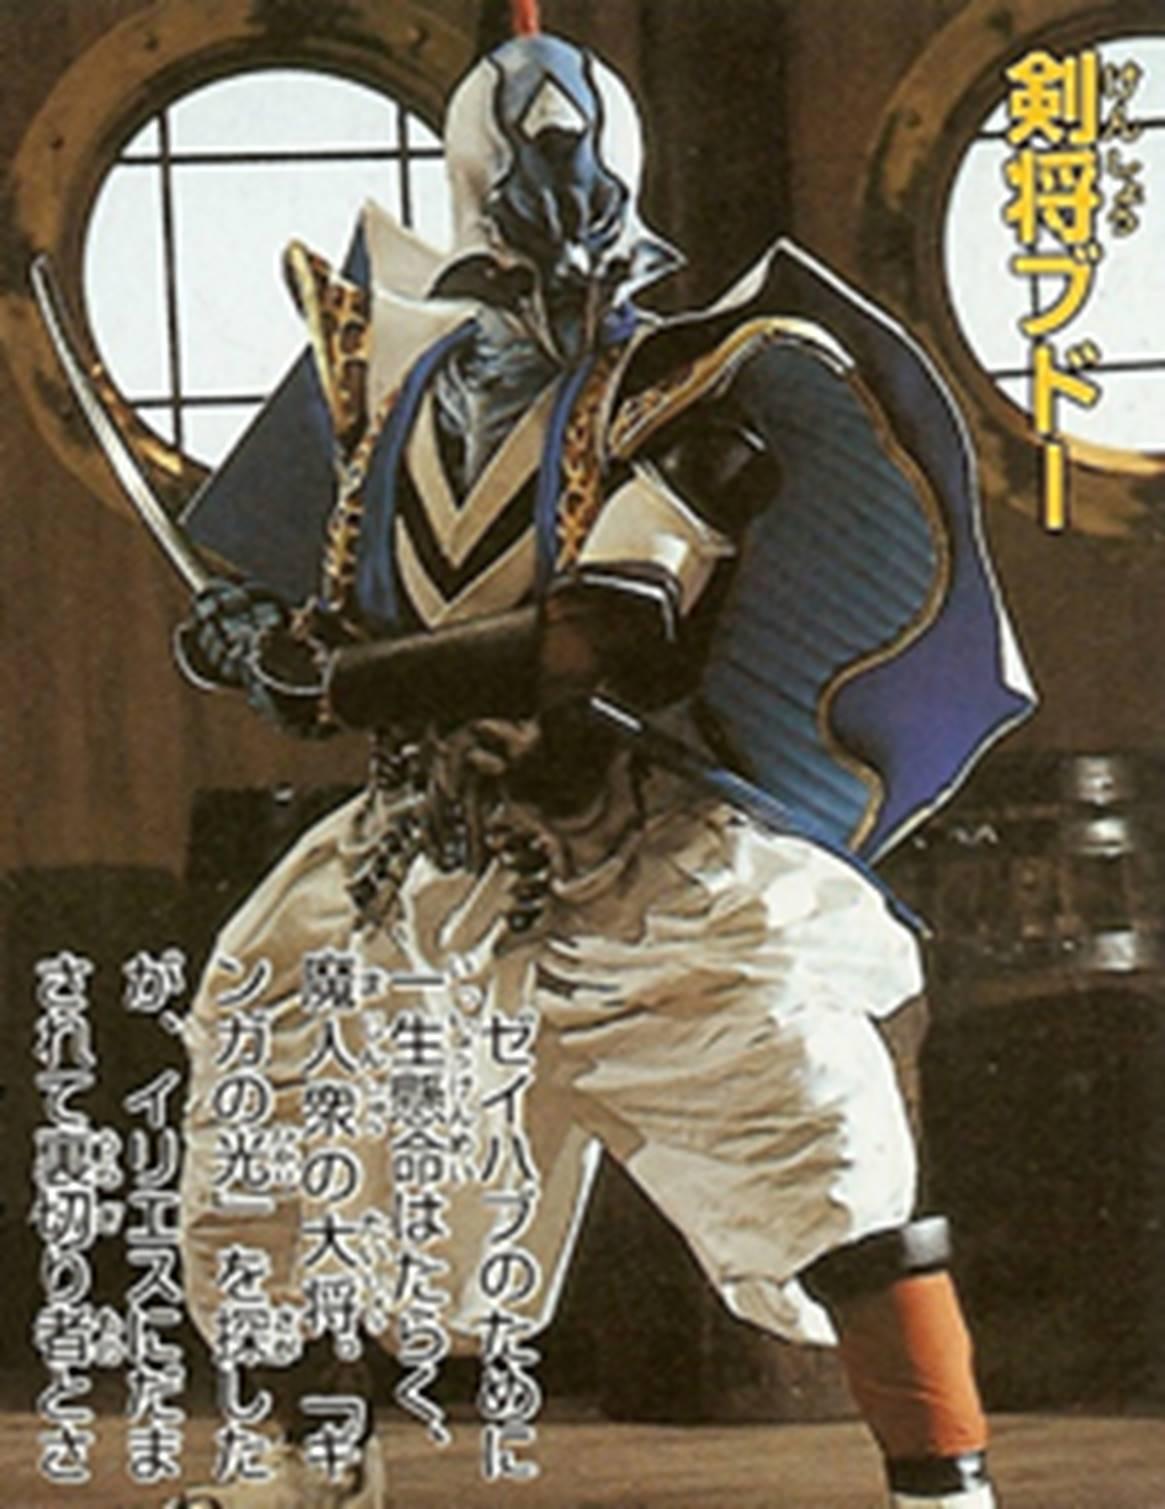 File:Ginga-vi-budou.jpg